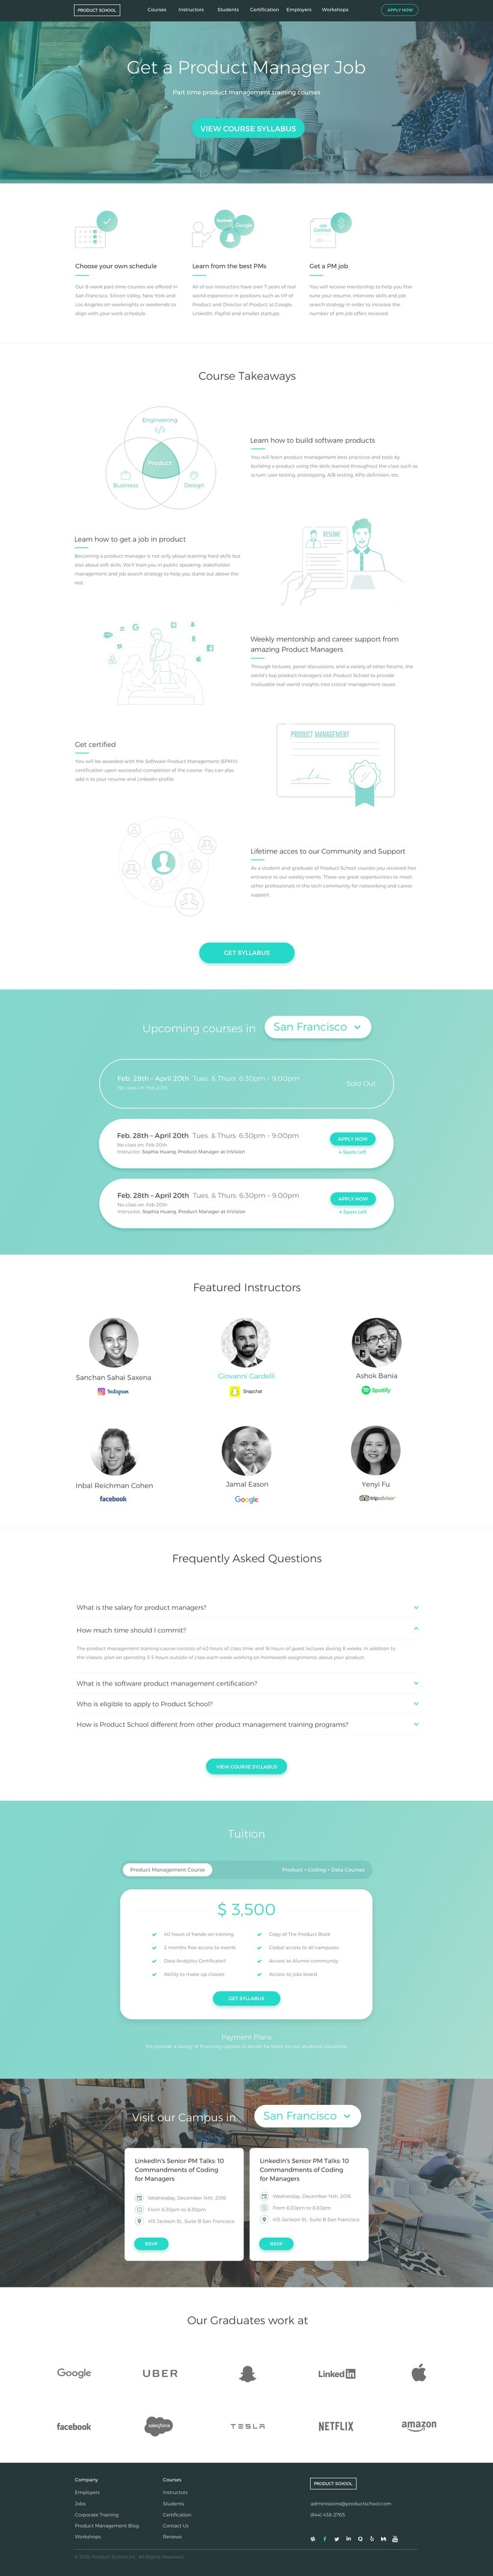 Product School - Responsive Web-Design 4